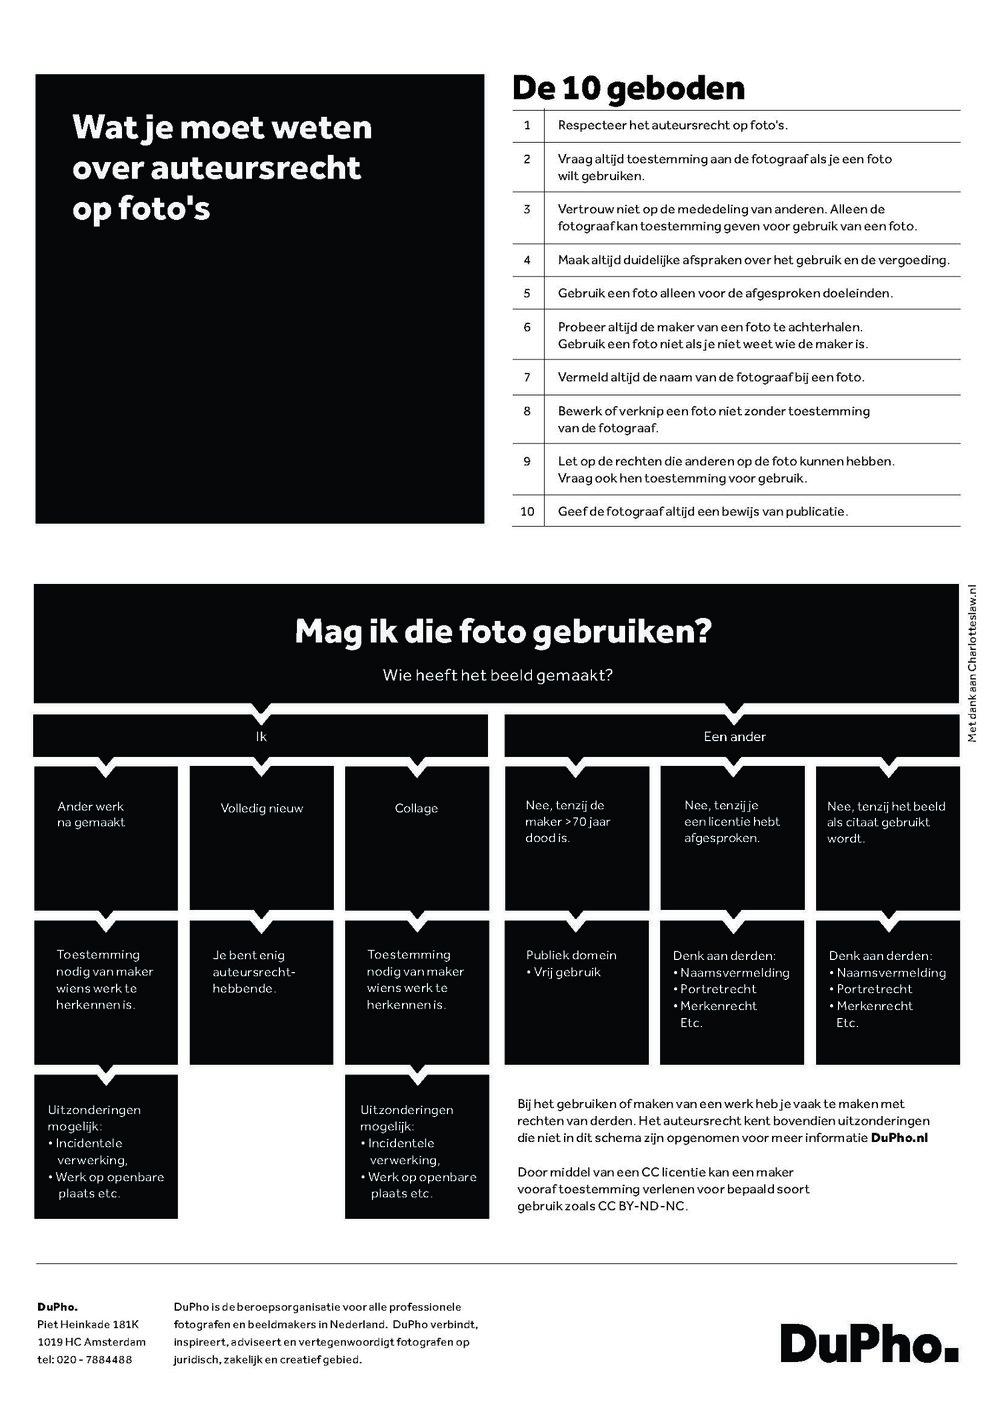 DuPho-Auteursrechtenkaartje_1500.jpg